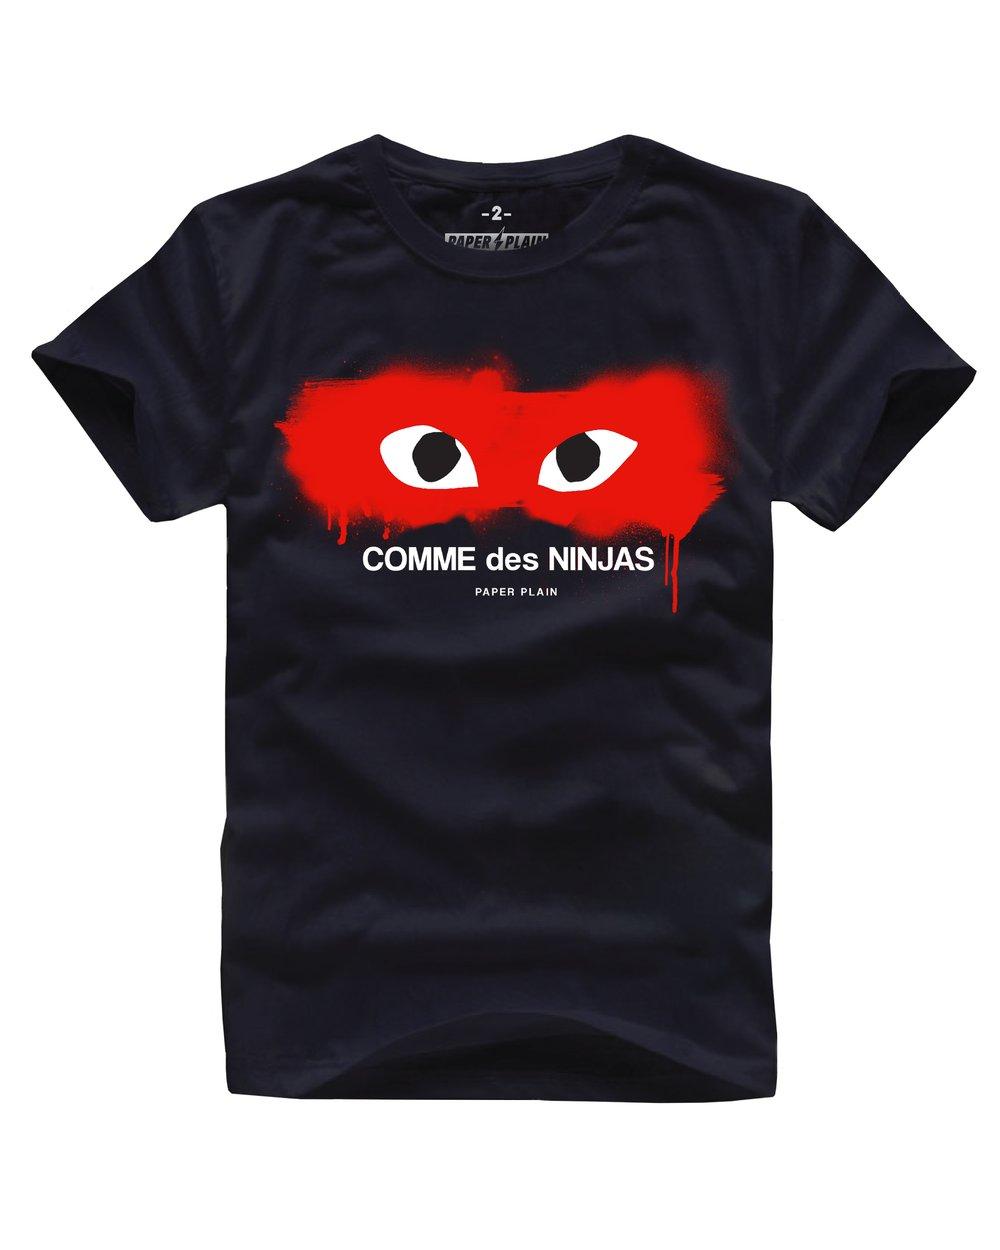 COMME DES NINJA 2.0 TEE BLACK/RED